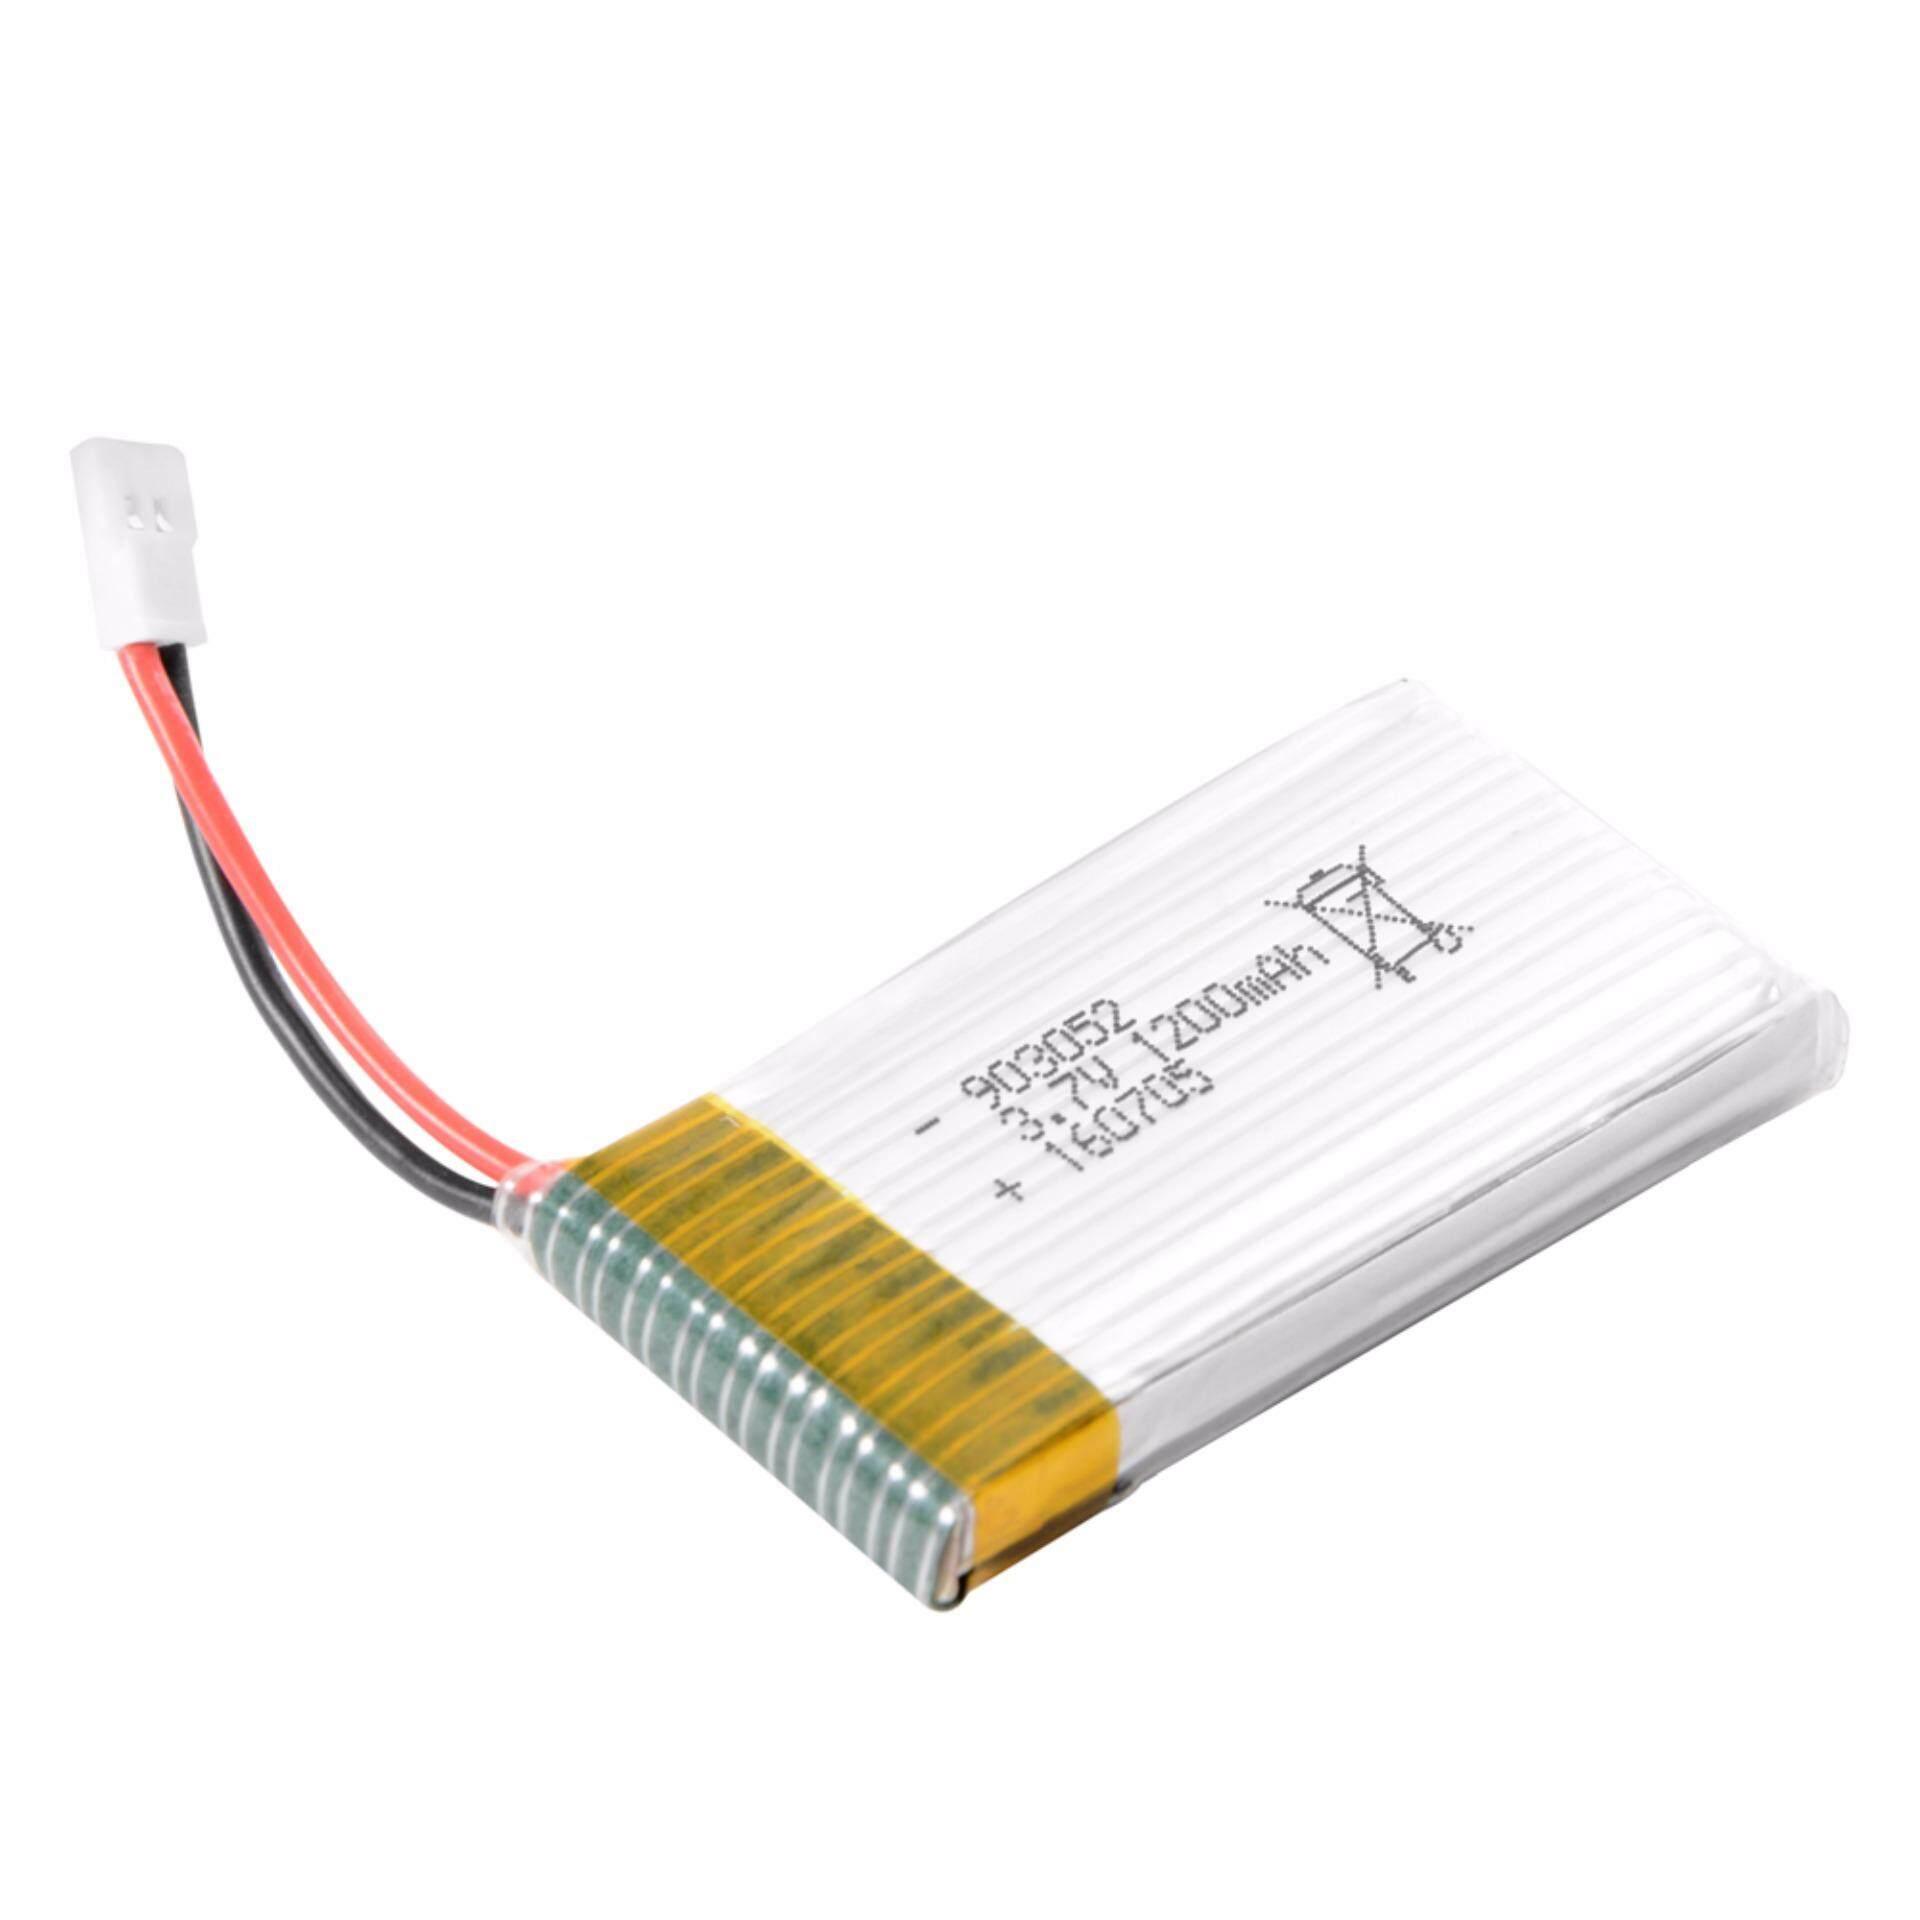 ... Syma X5SW X5SC RC306 Terbaru. 5in1 Set Pengisi Daya dengan 5 Pcs 3.7 V 1200 MAh Li-po Baterai untuk ...